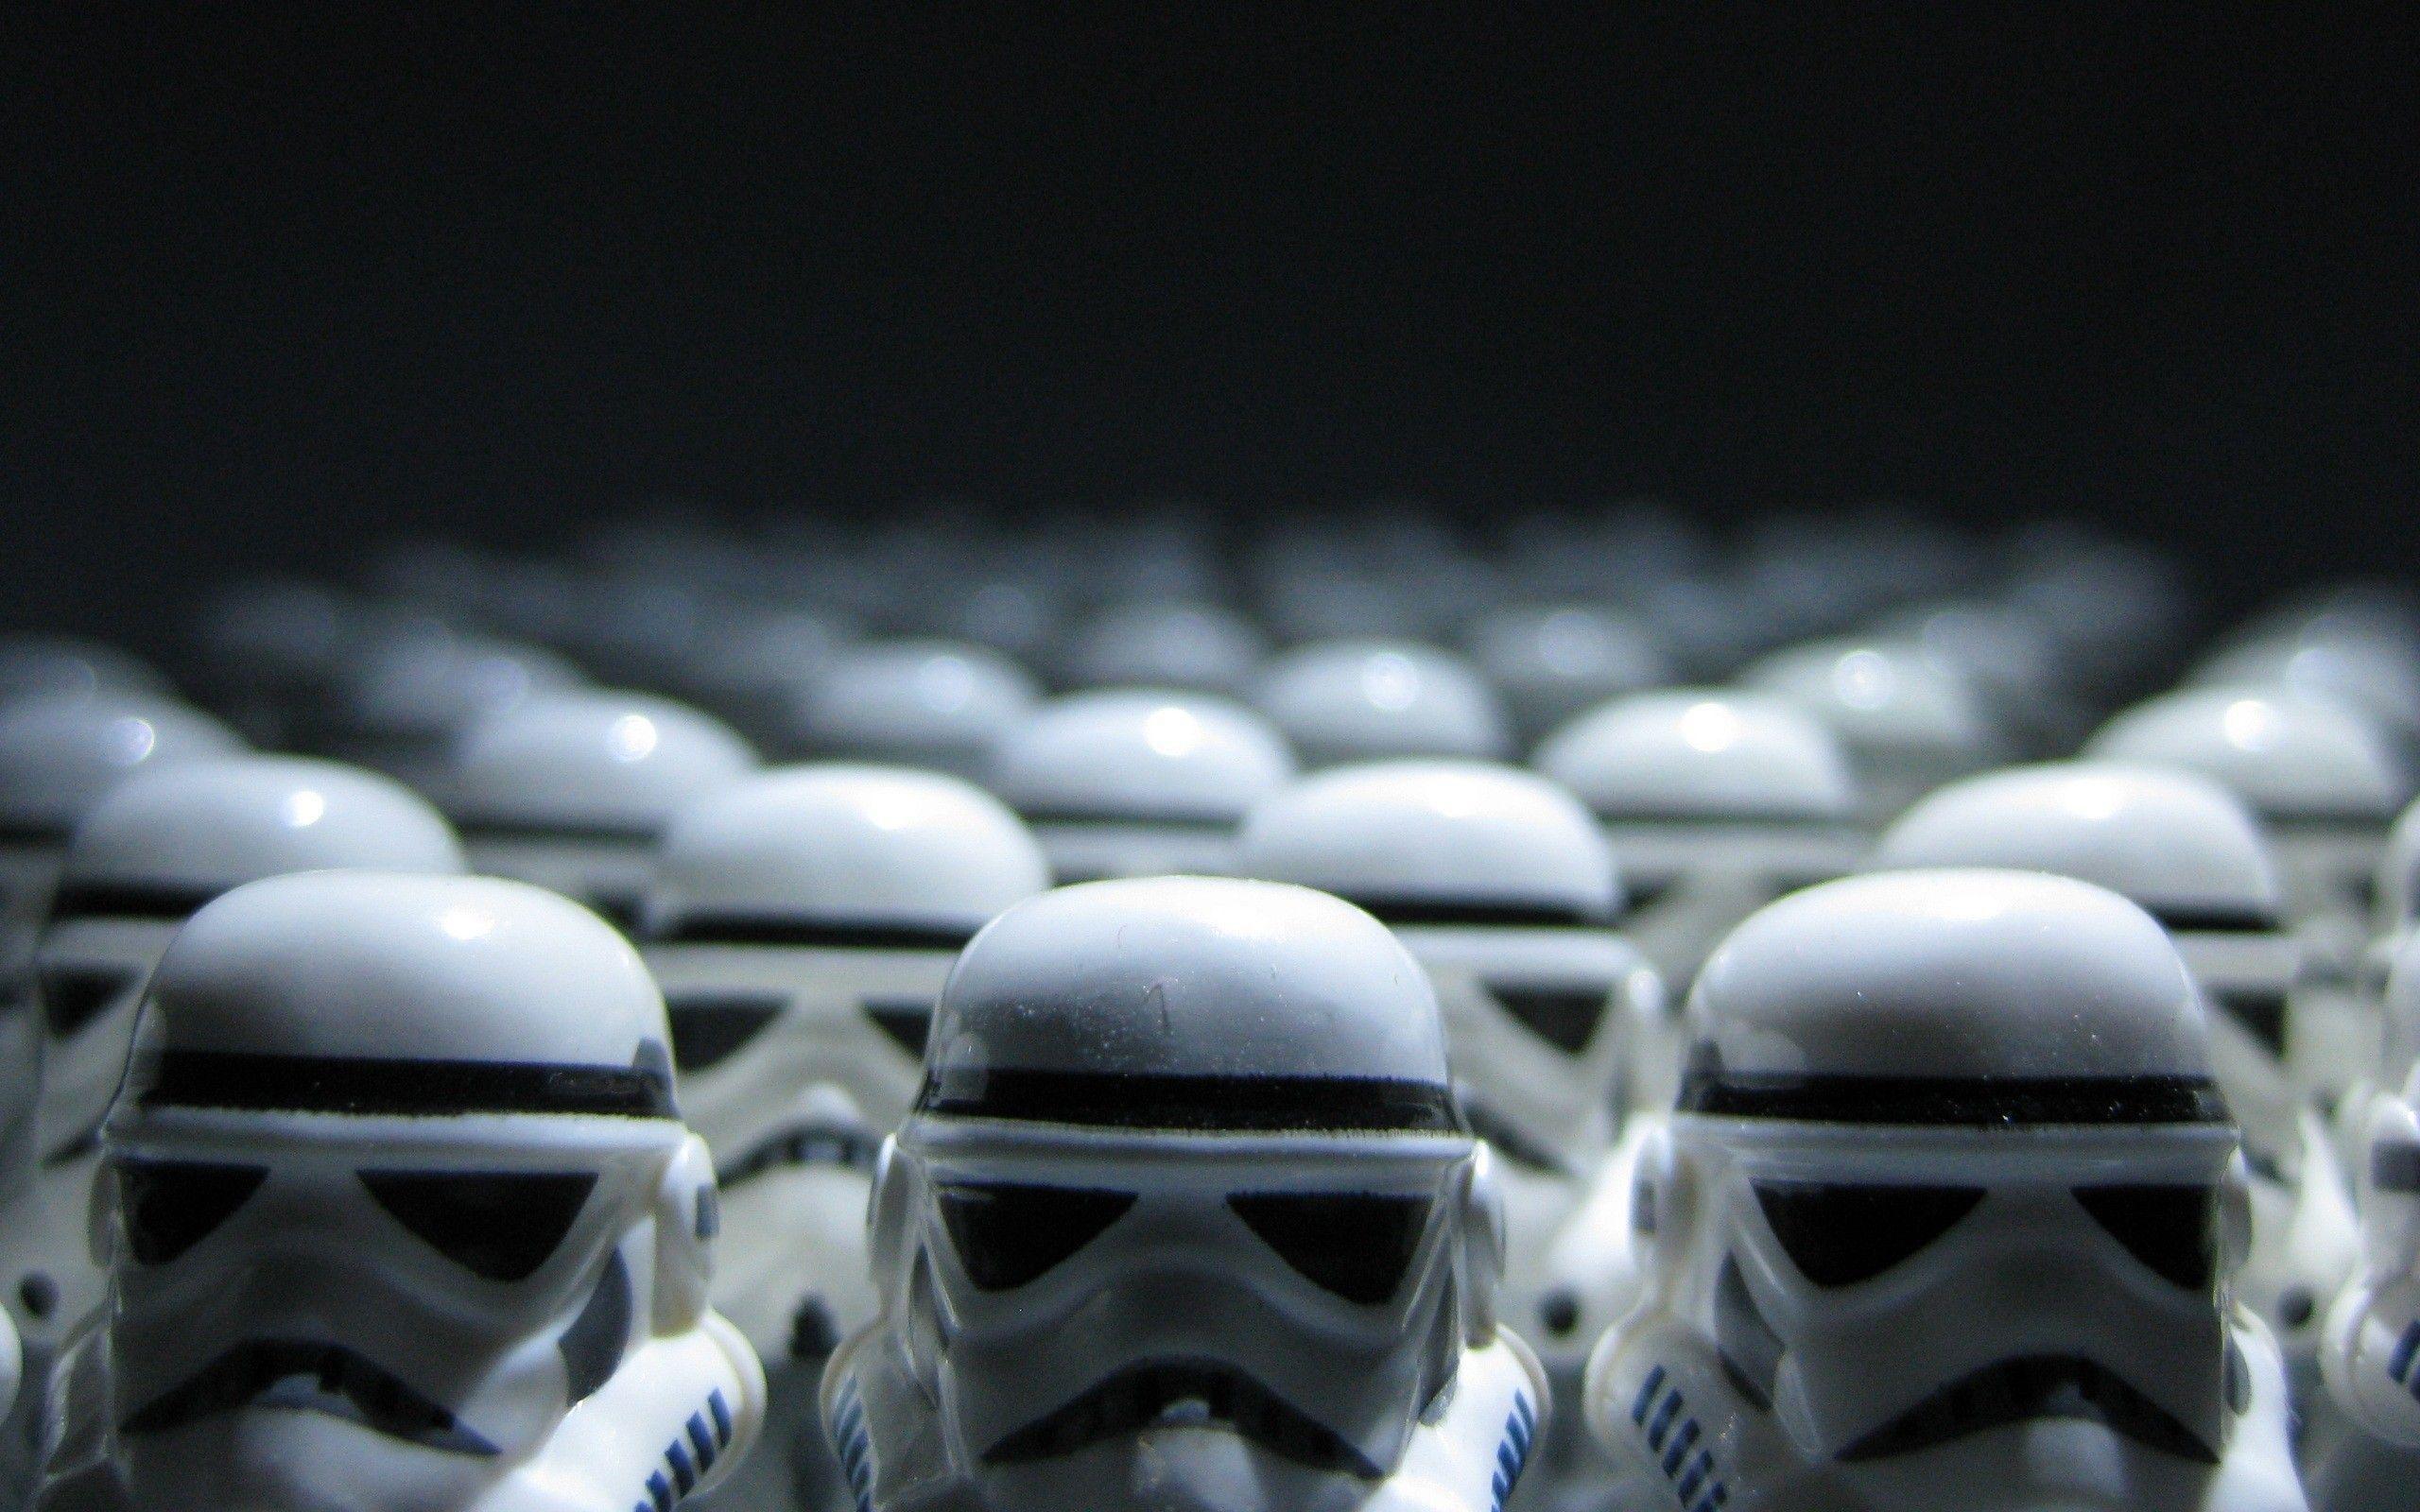 Star Wars Stormtrooper Wallpapers Wallpaper Cave